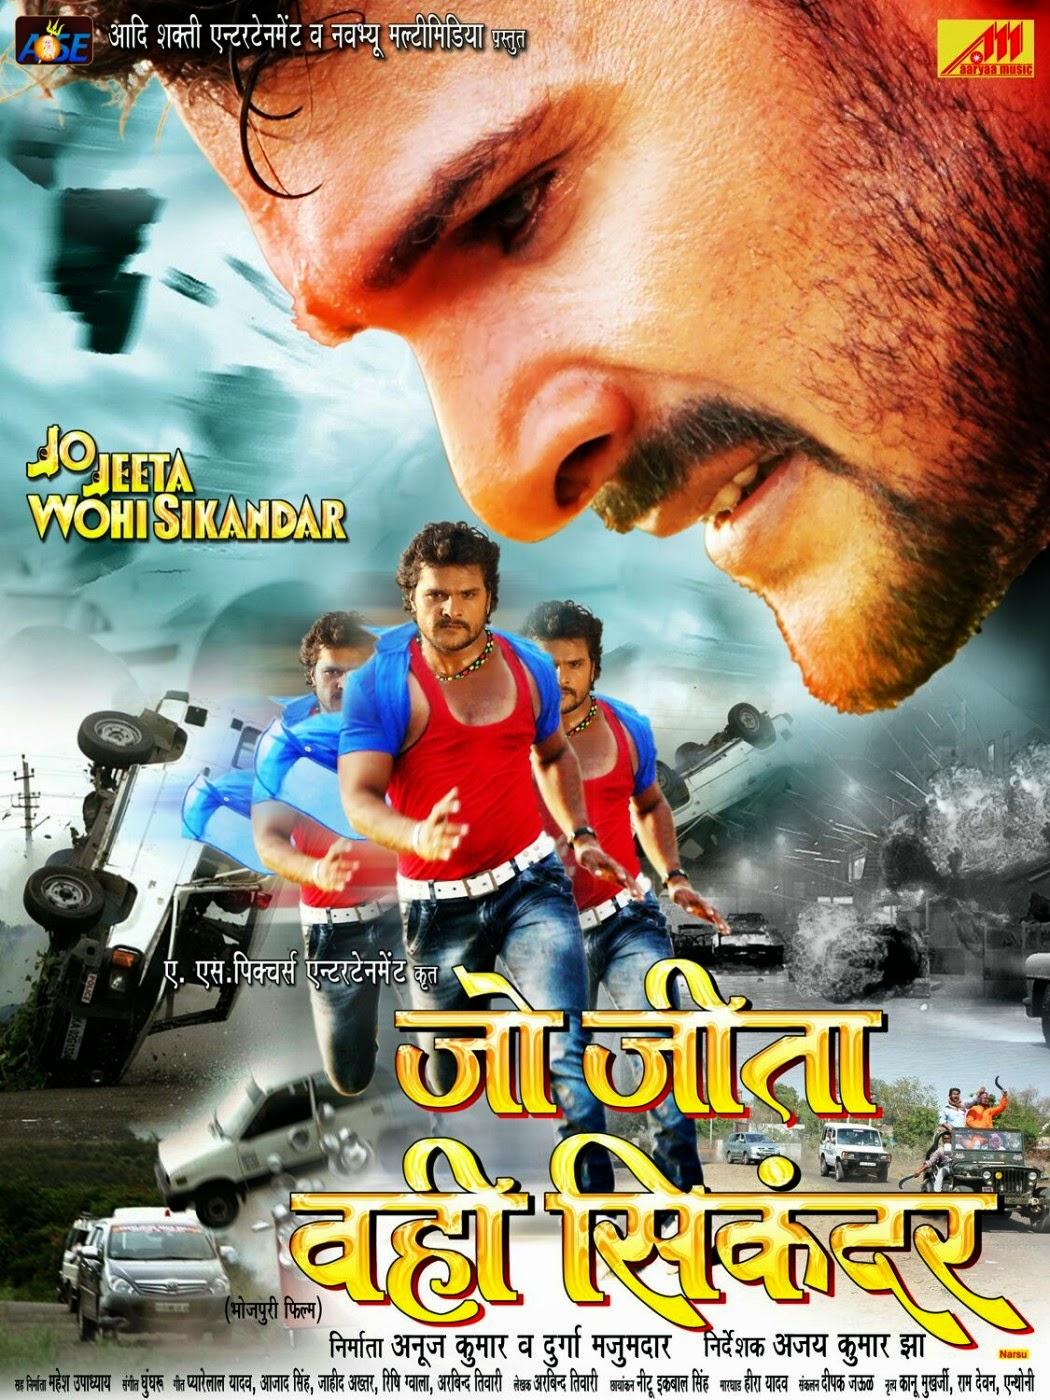 Jo Jeeta Wohi Sikander Bhojpuri Movie First Look Poster